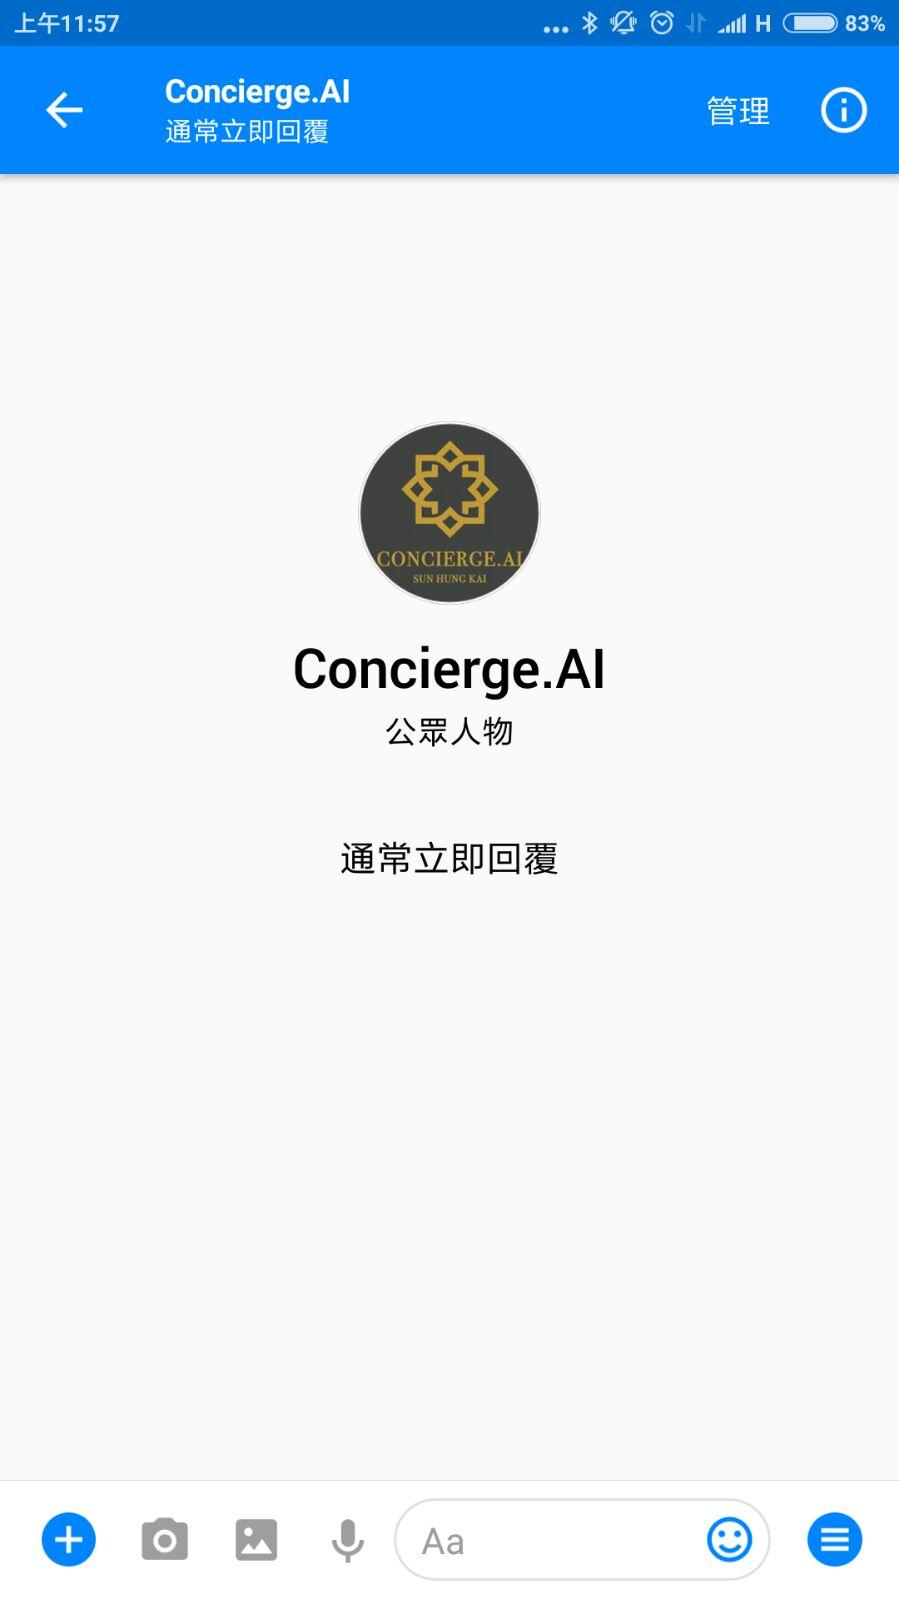 Whatsapp_image_2017-10-22_at_12.11.00_pm